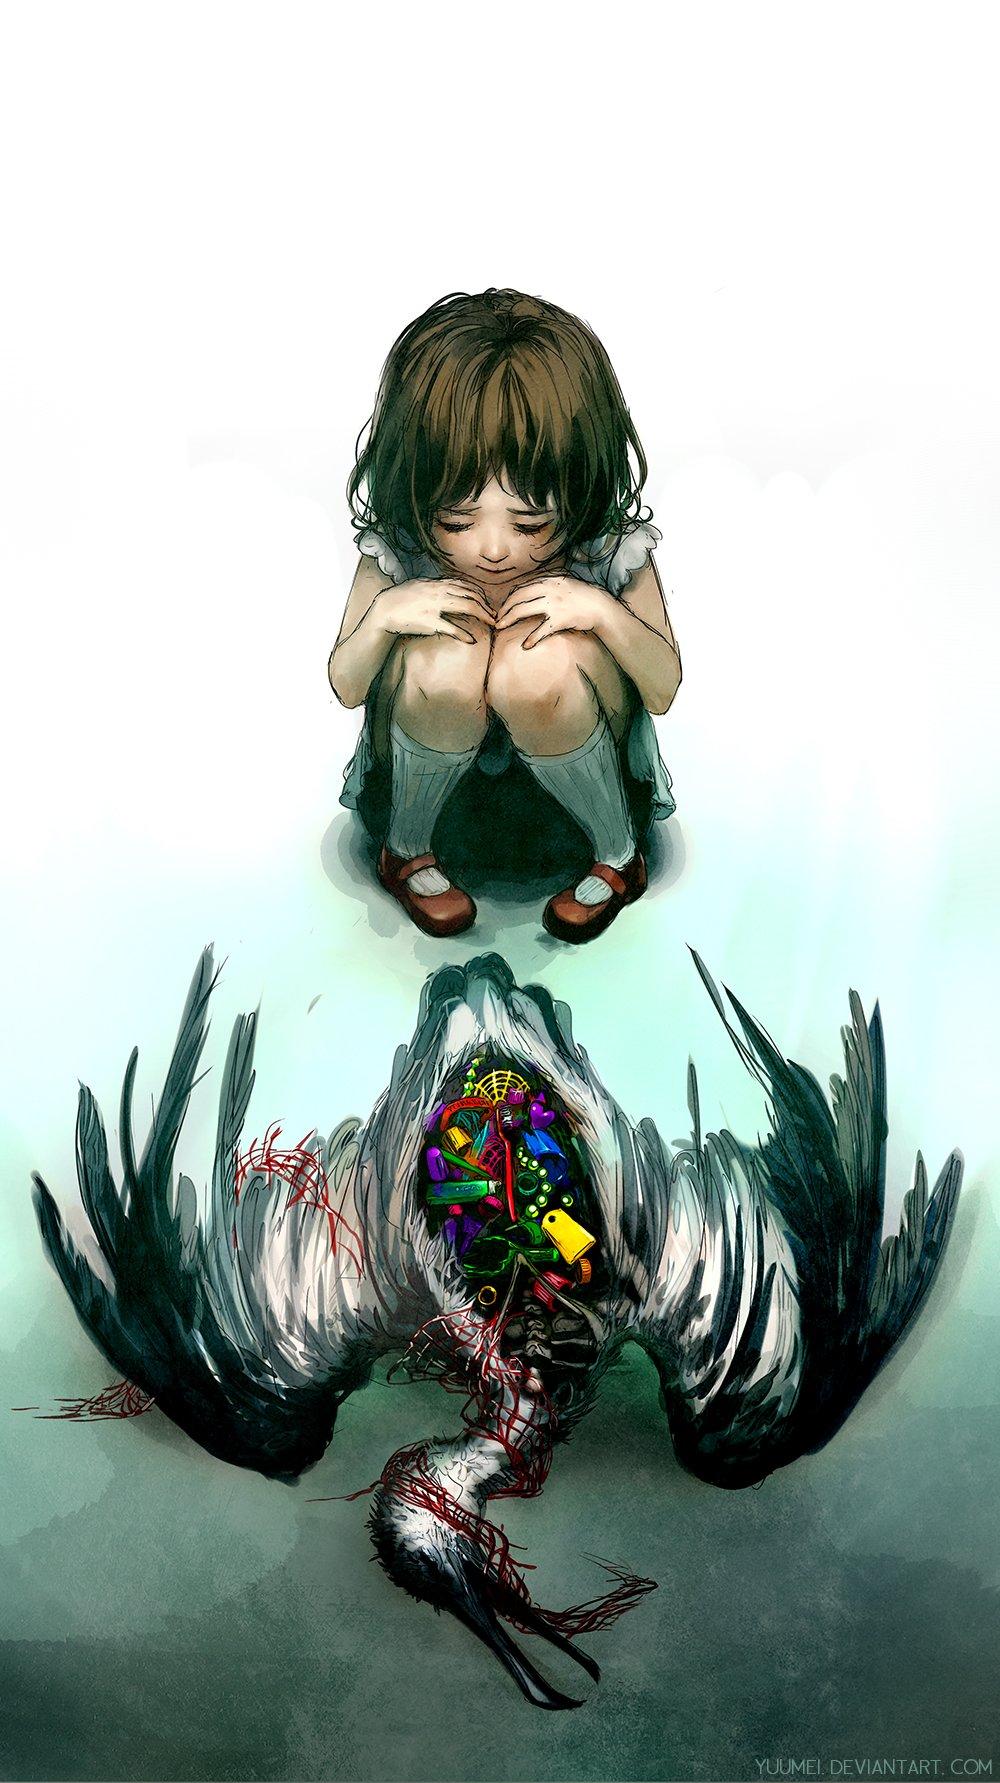 Art Yuumei и ее легкий сюрреализм. - Изображение 7